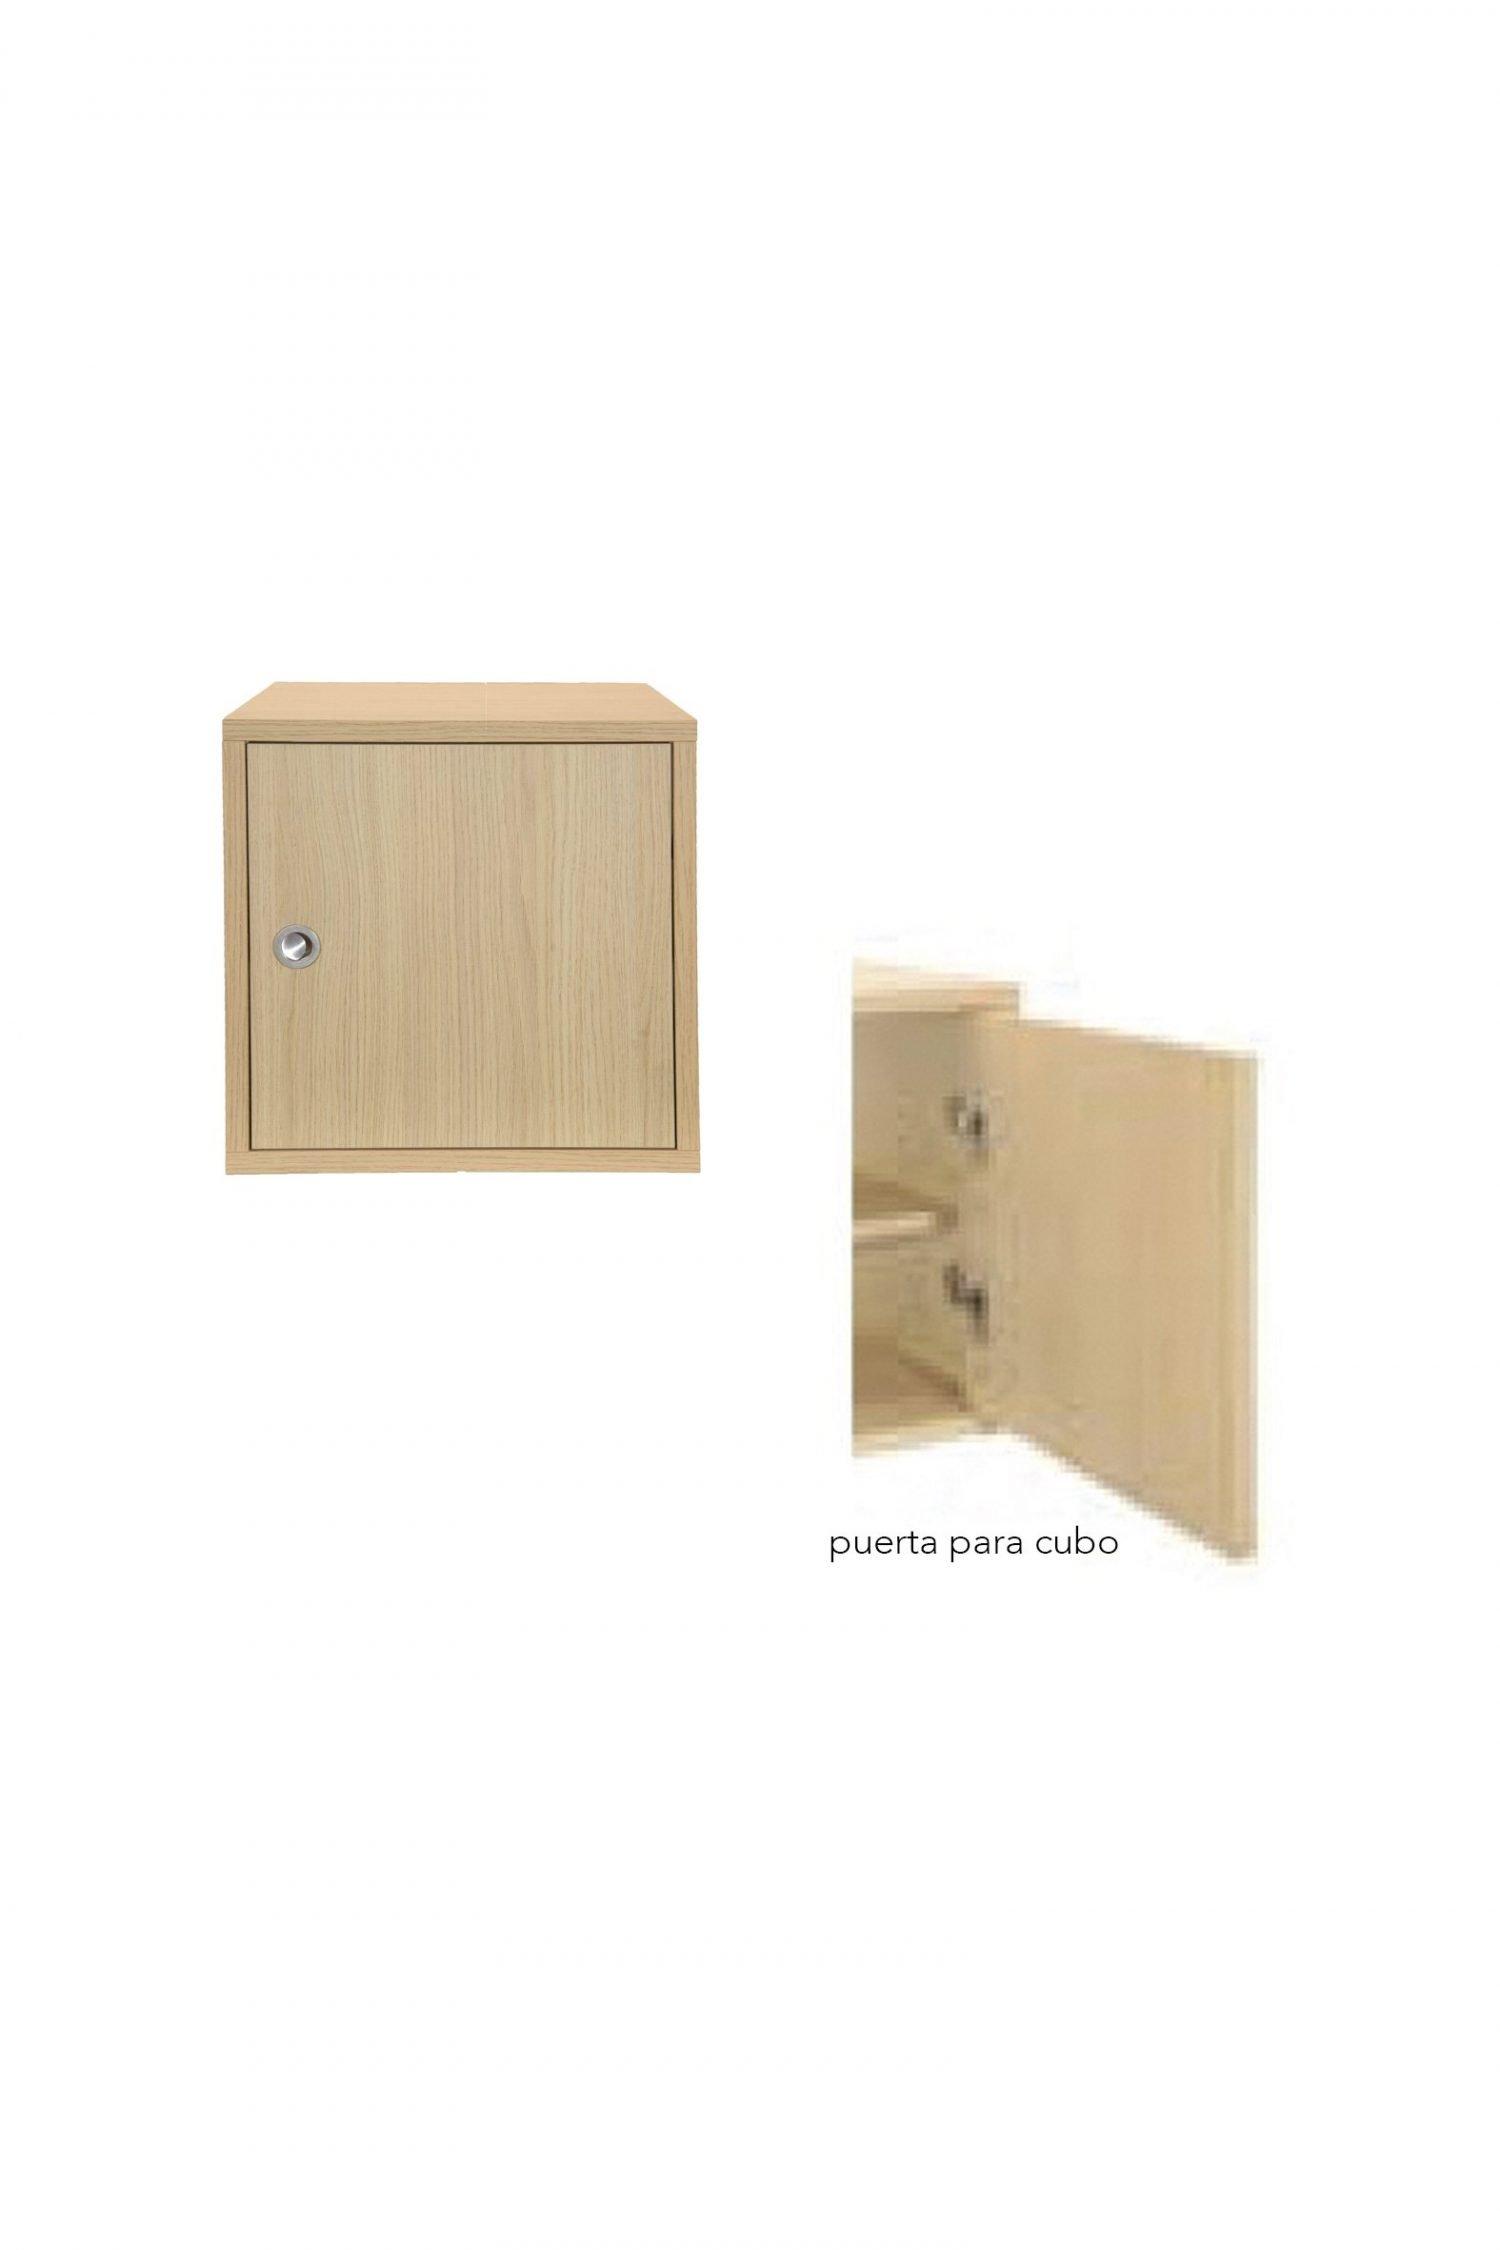 Puerta para cubos Ref: 021